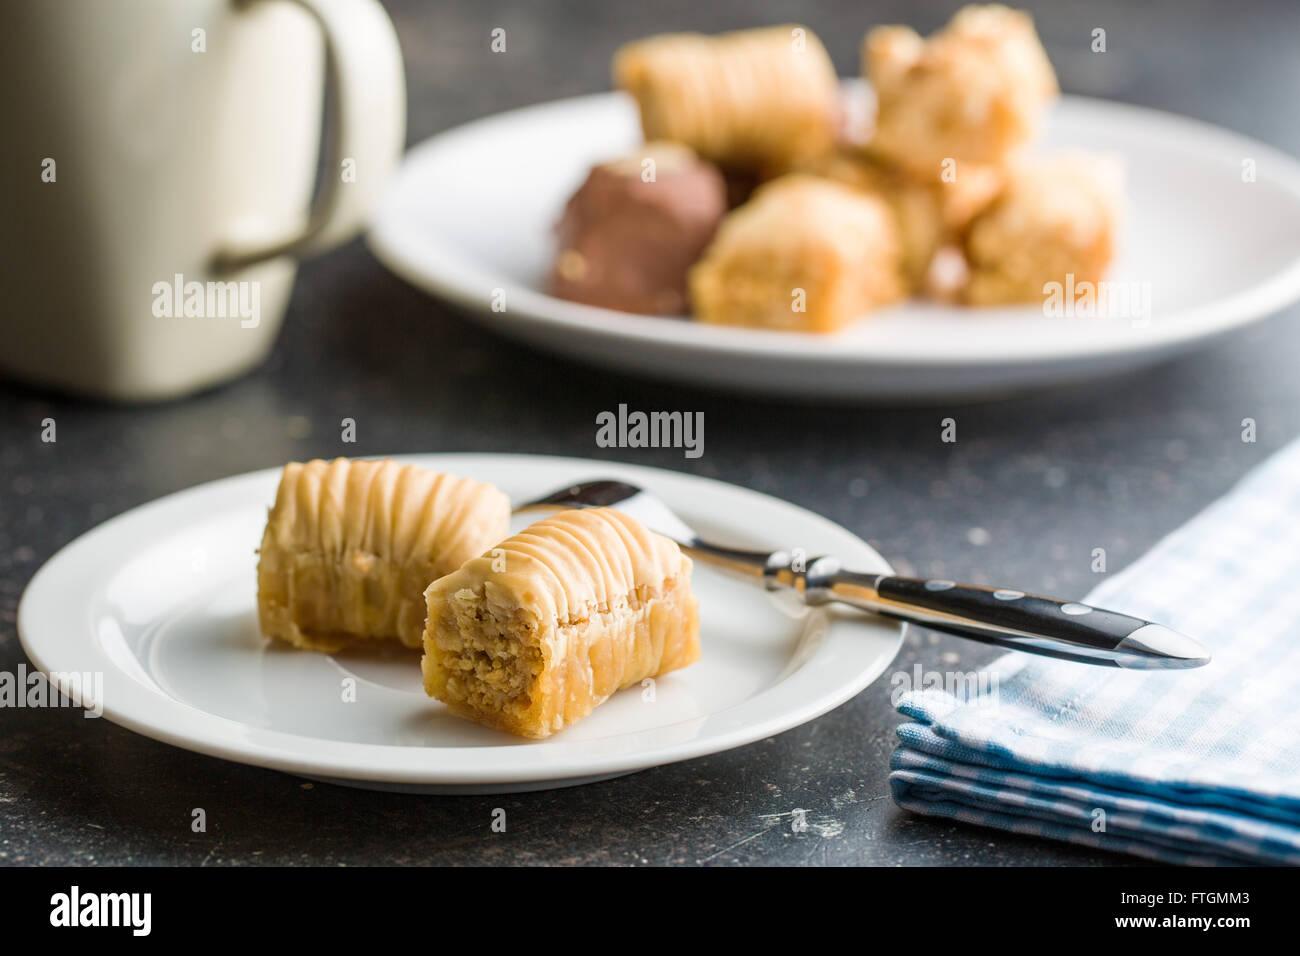 sweet baklava dessert on plate - Stock Image